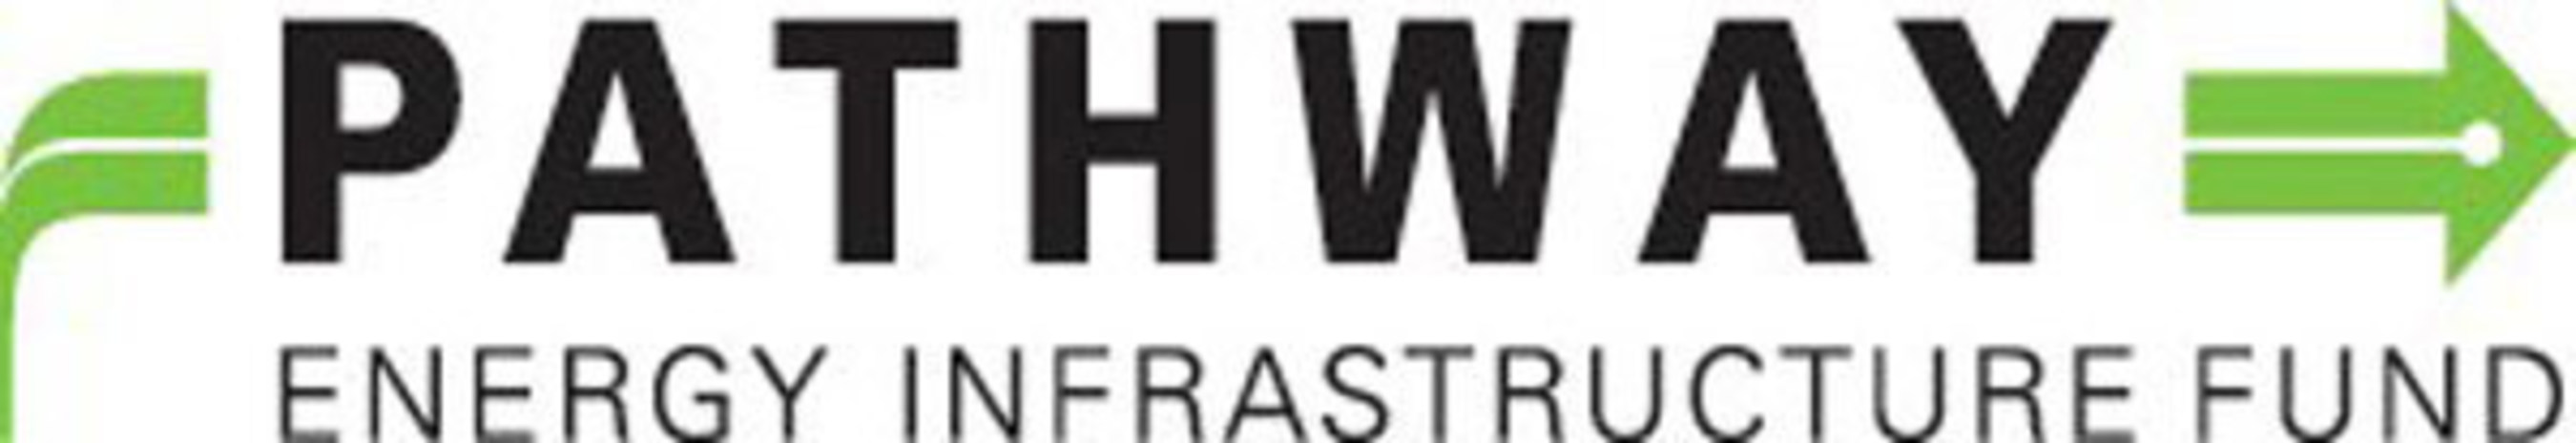 Pathway Energy Infrastructure Fund, Inc. Logo